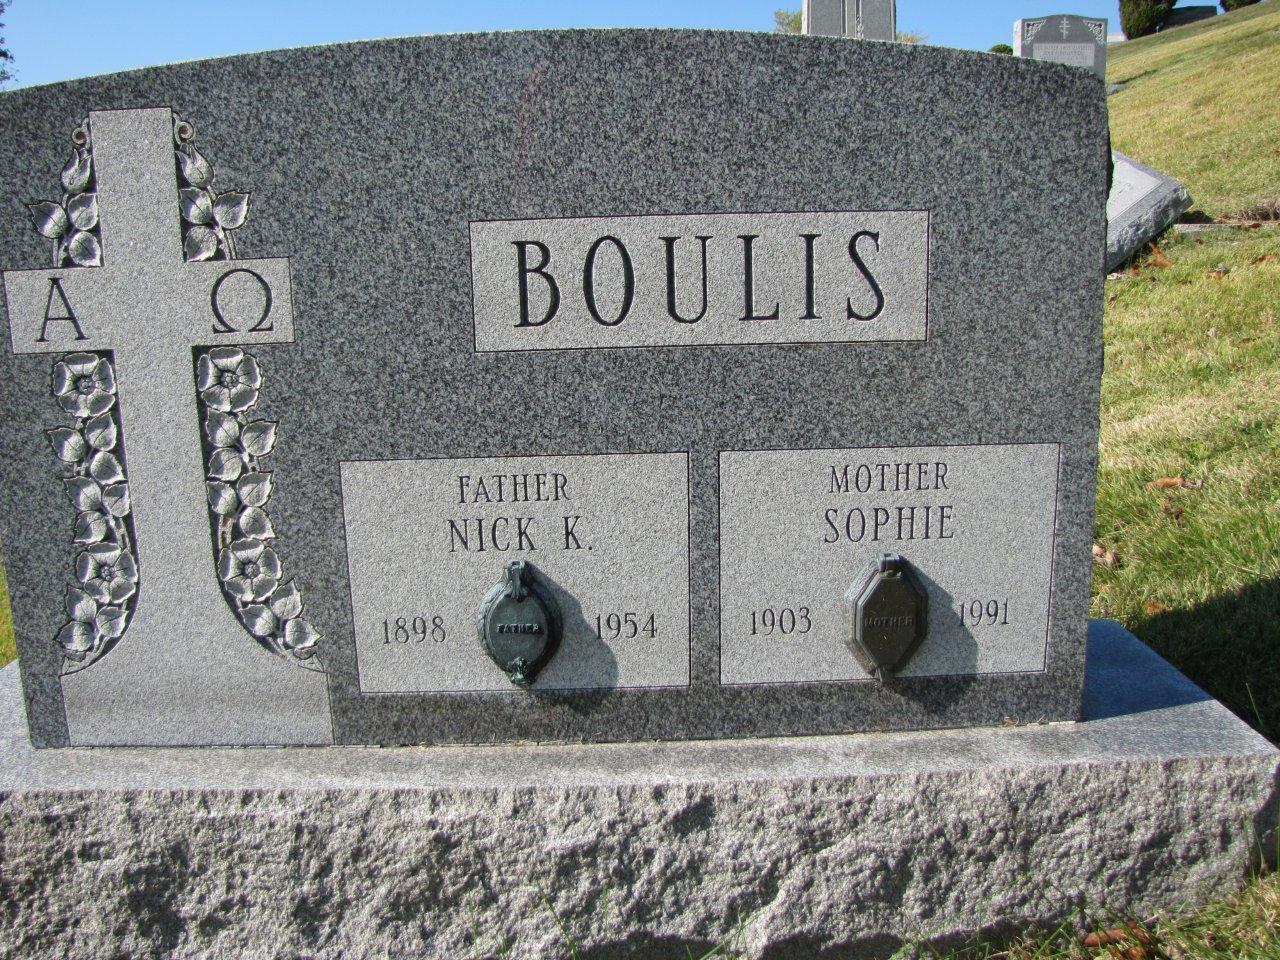 Nick K Boulis